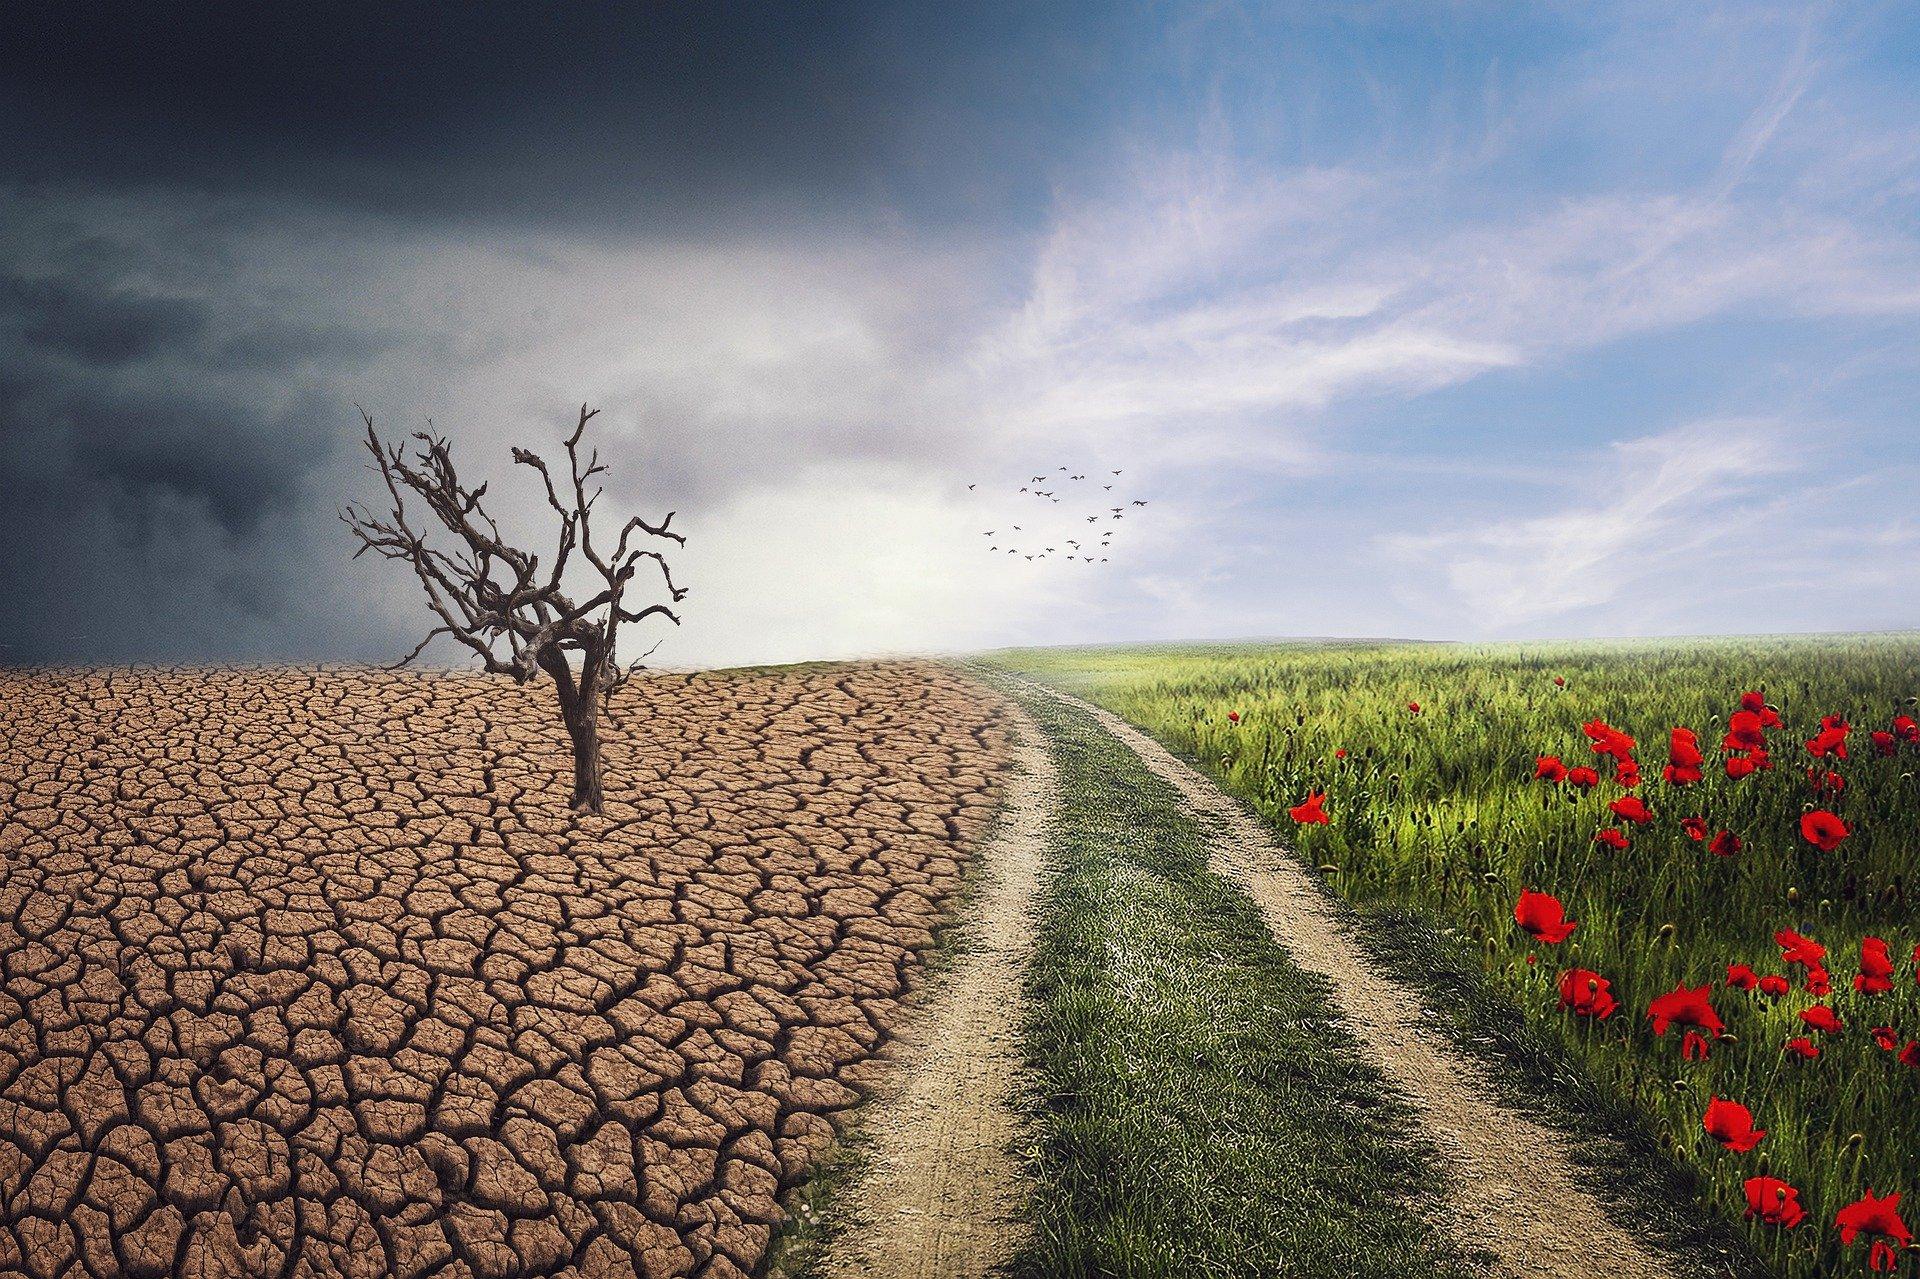 The BritishSpanish Society Climate Change Panel